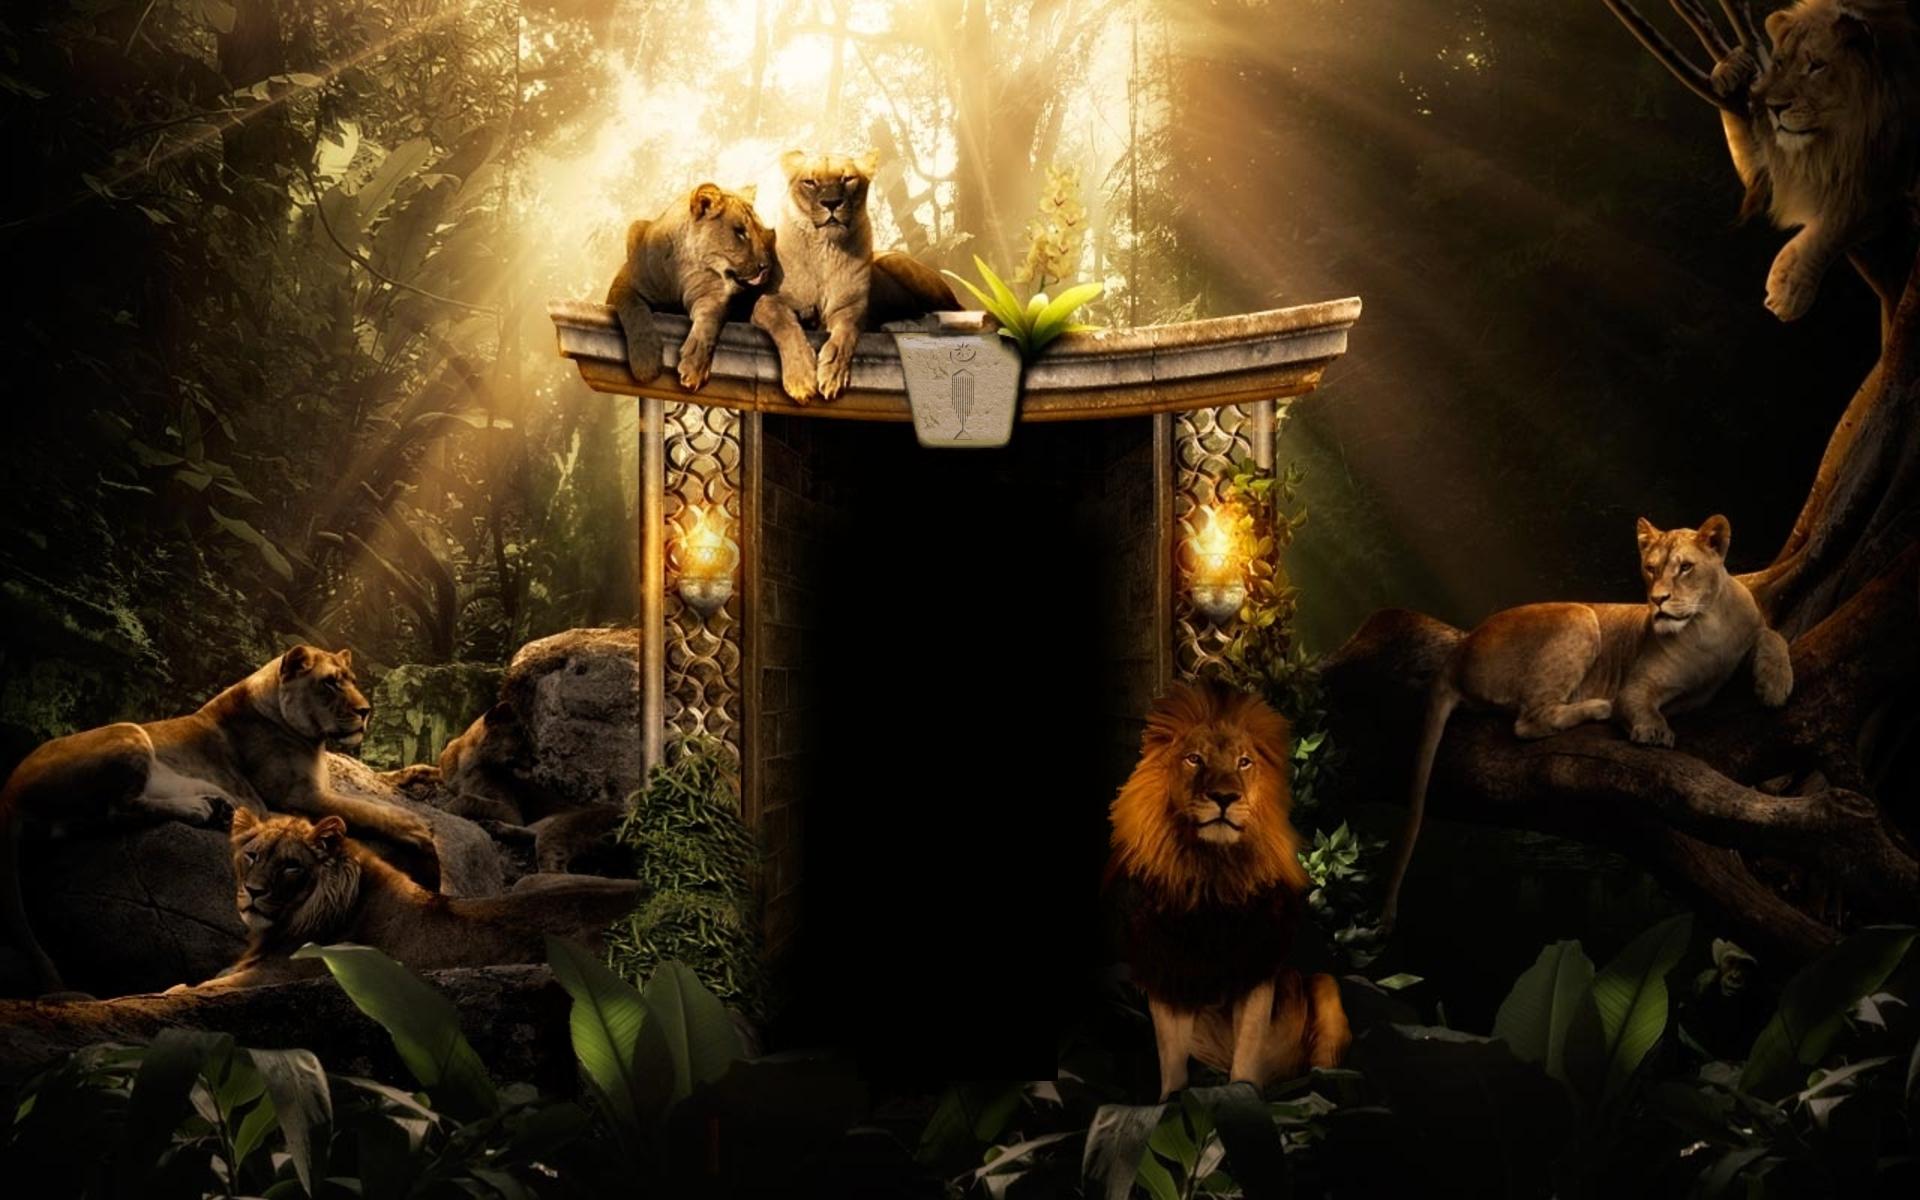 The Hidden Doorway - ayahuasca retreats (Amsterdam and Ecuador)